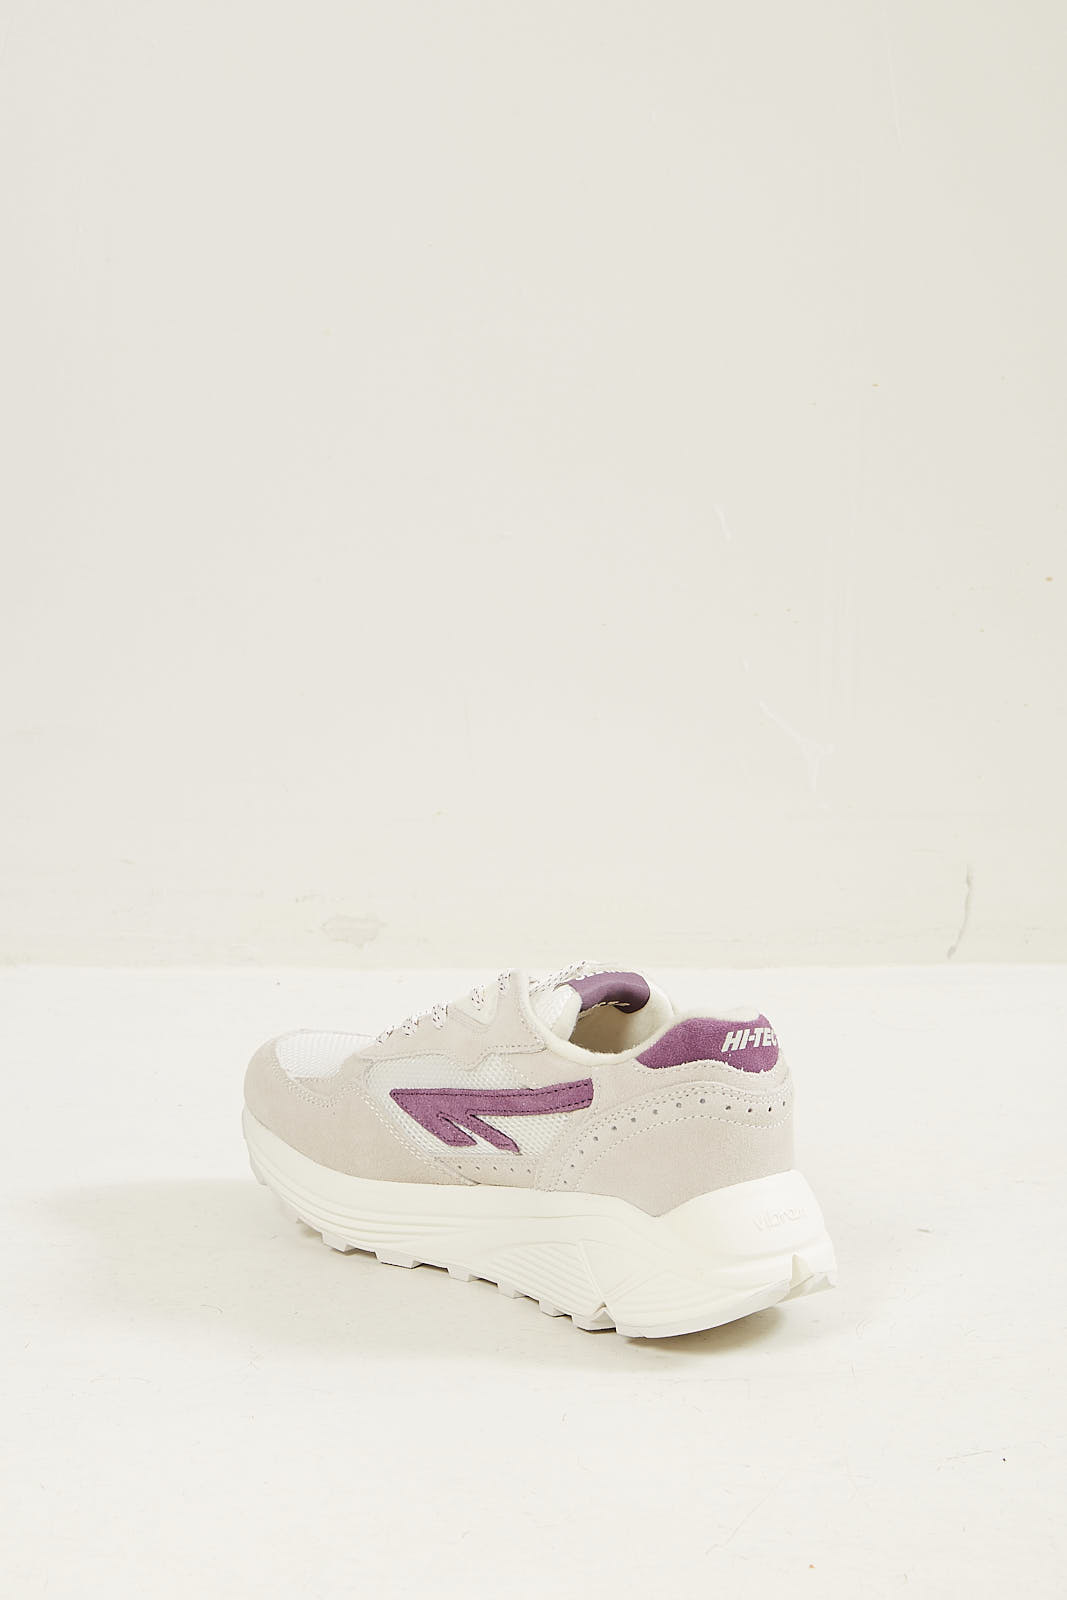 Hi-Tec - Hts silver shadow sneakers 016 cotton purple dusk